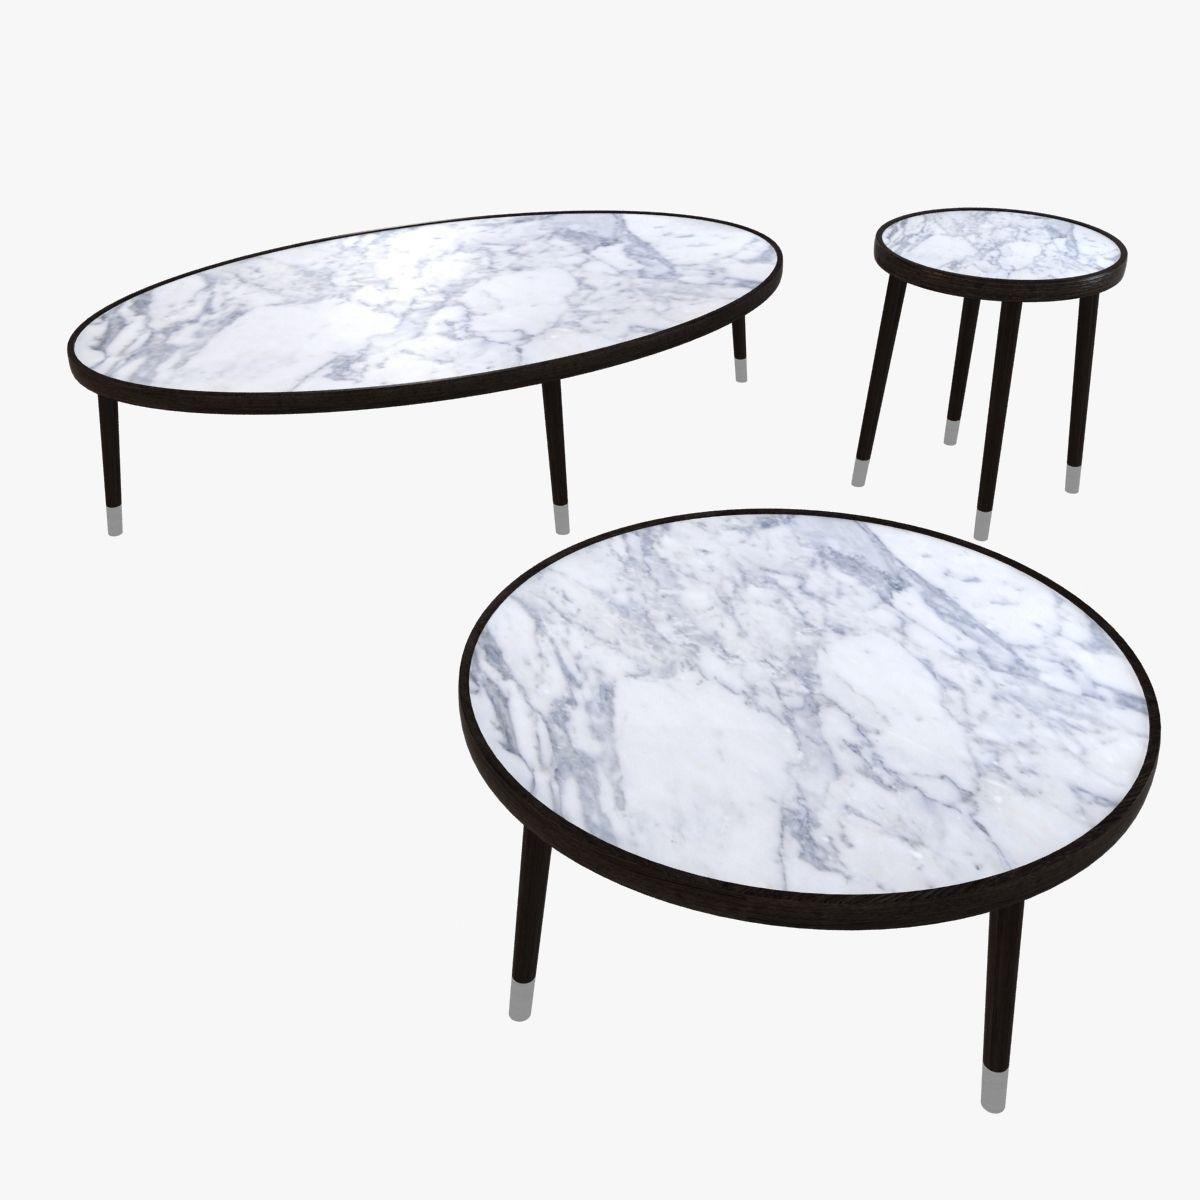 Bigne porada coffee table 3d model max obj 3ds fbx mtl for Coffee table 3d model